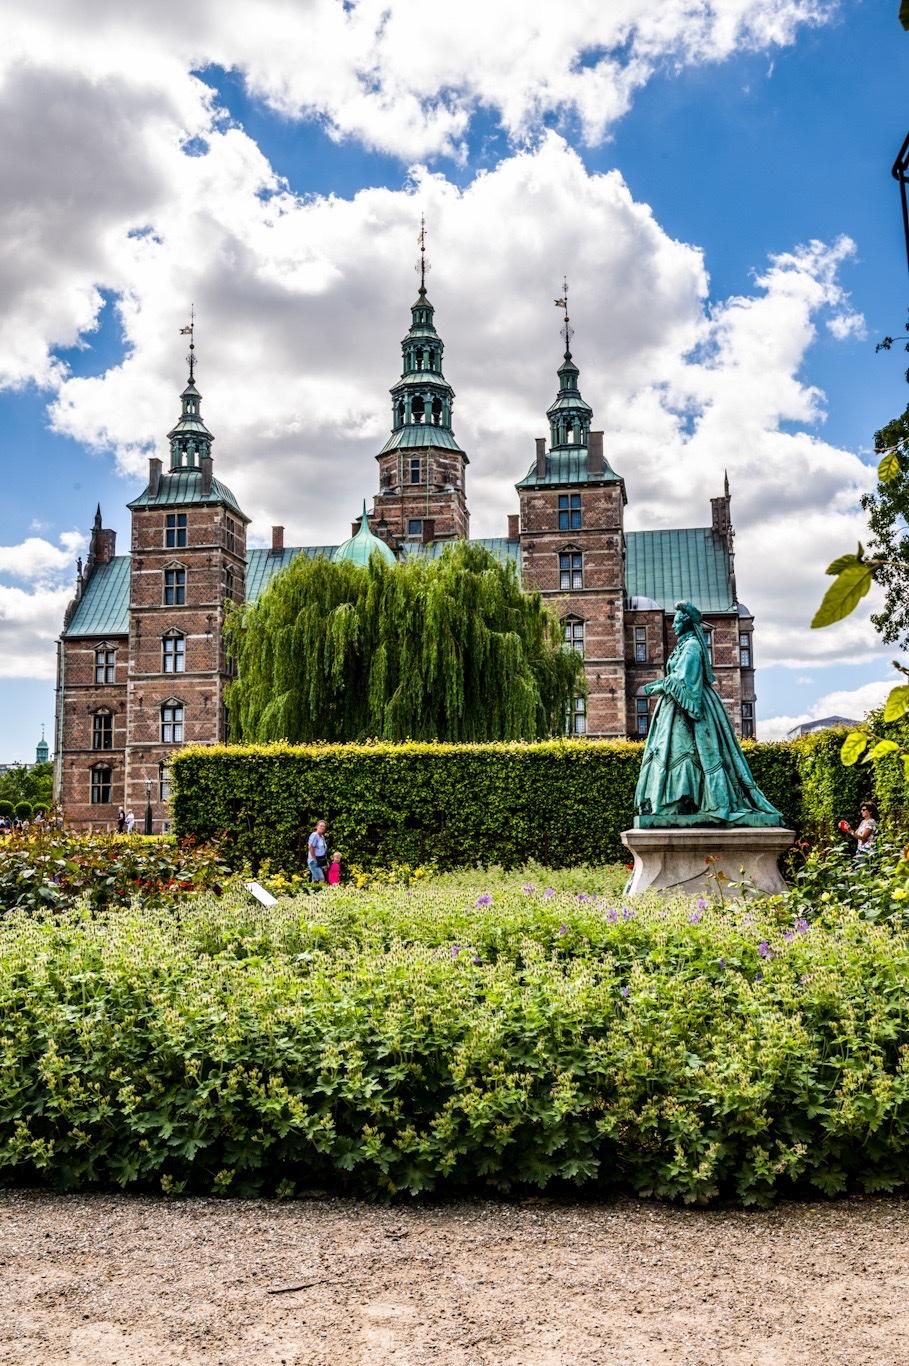 Green Spaces  Near Rosenborg Castle in Copenhagen